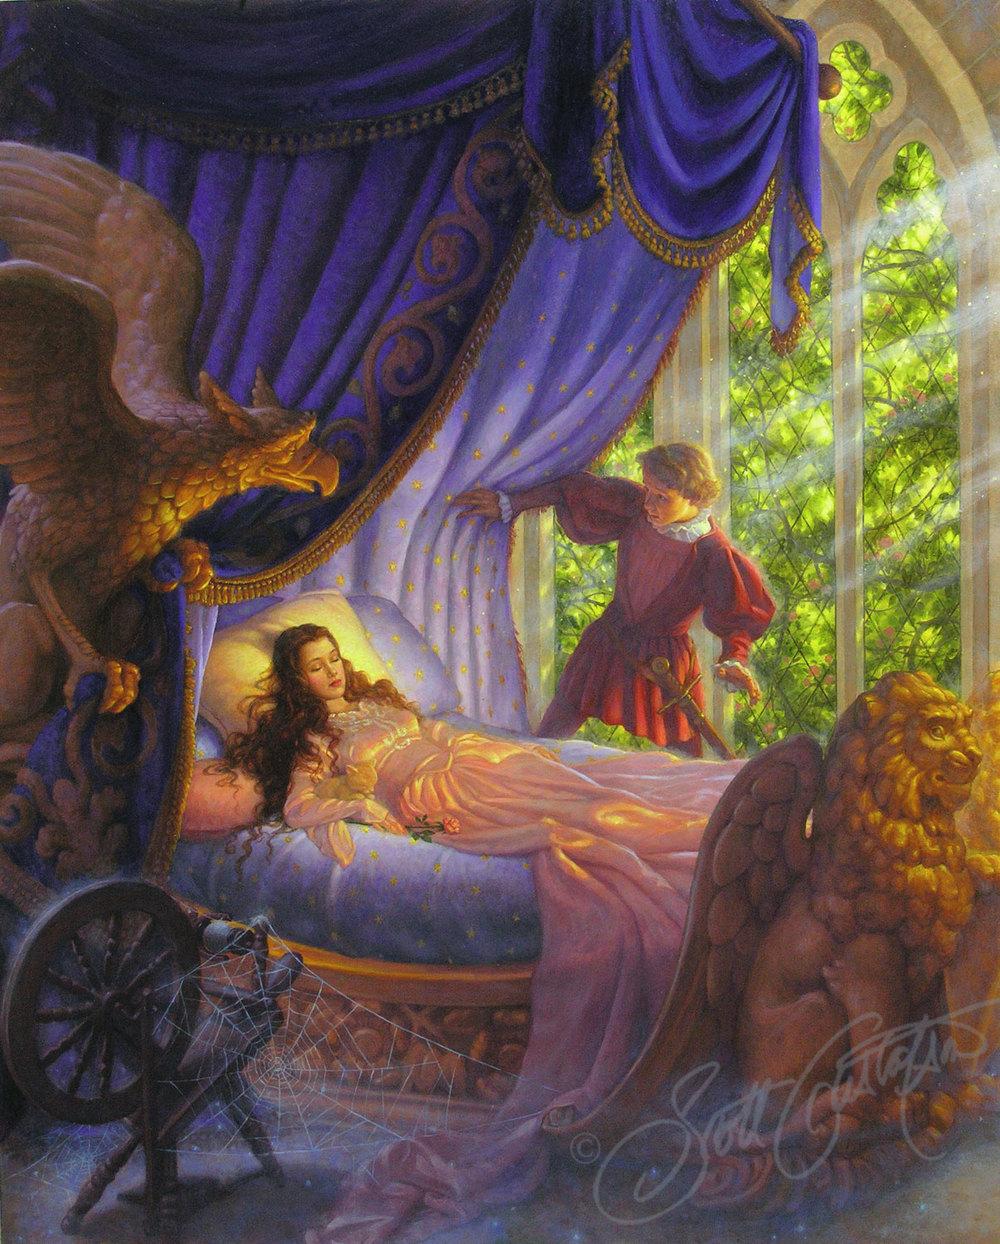 Copy of Sleeping Beauty